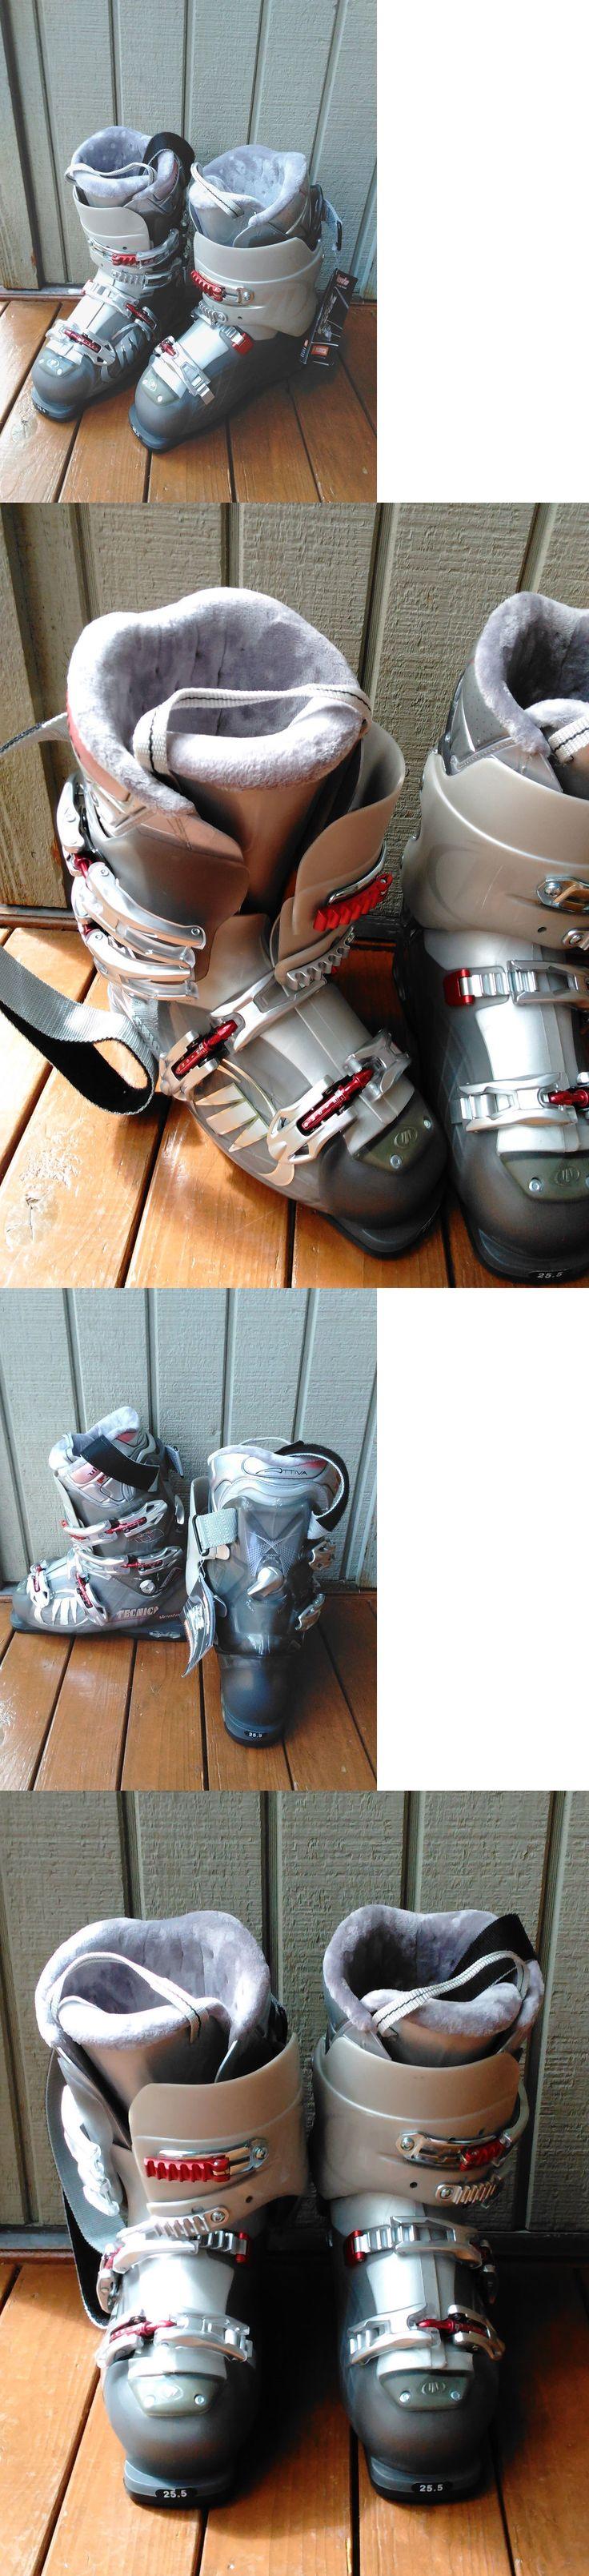 Women 21241: 25.5 Mondo New Tecnica Vento 6 Ski Boots -> BUY IT NOW ONLY: $95 on eBay!